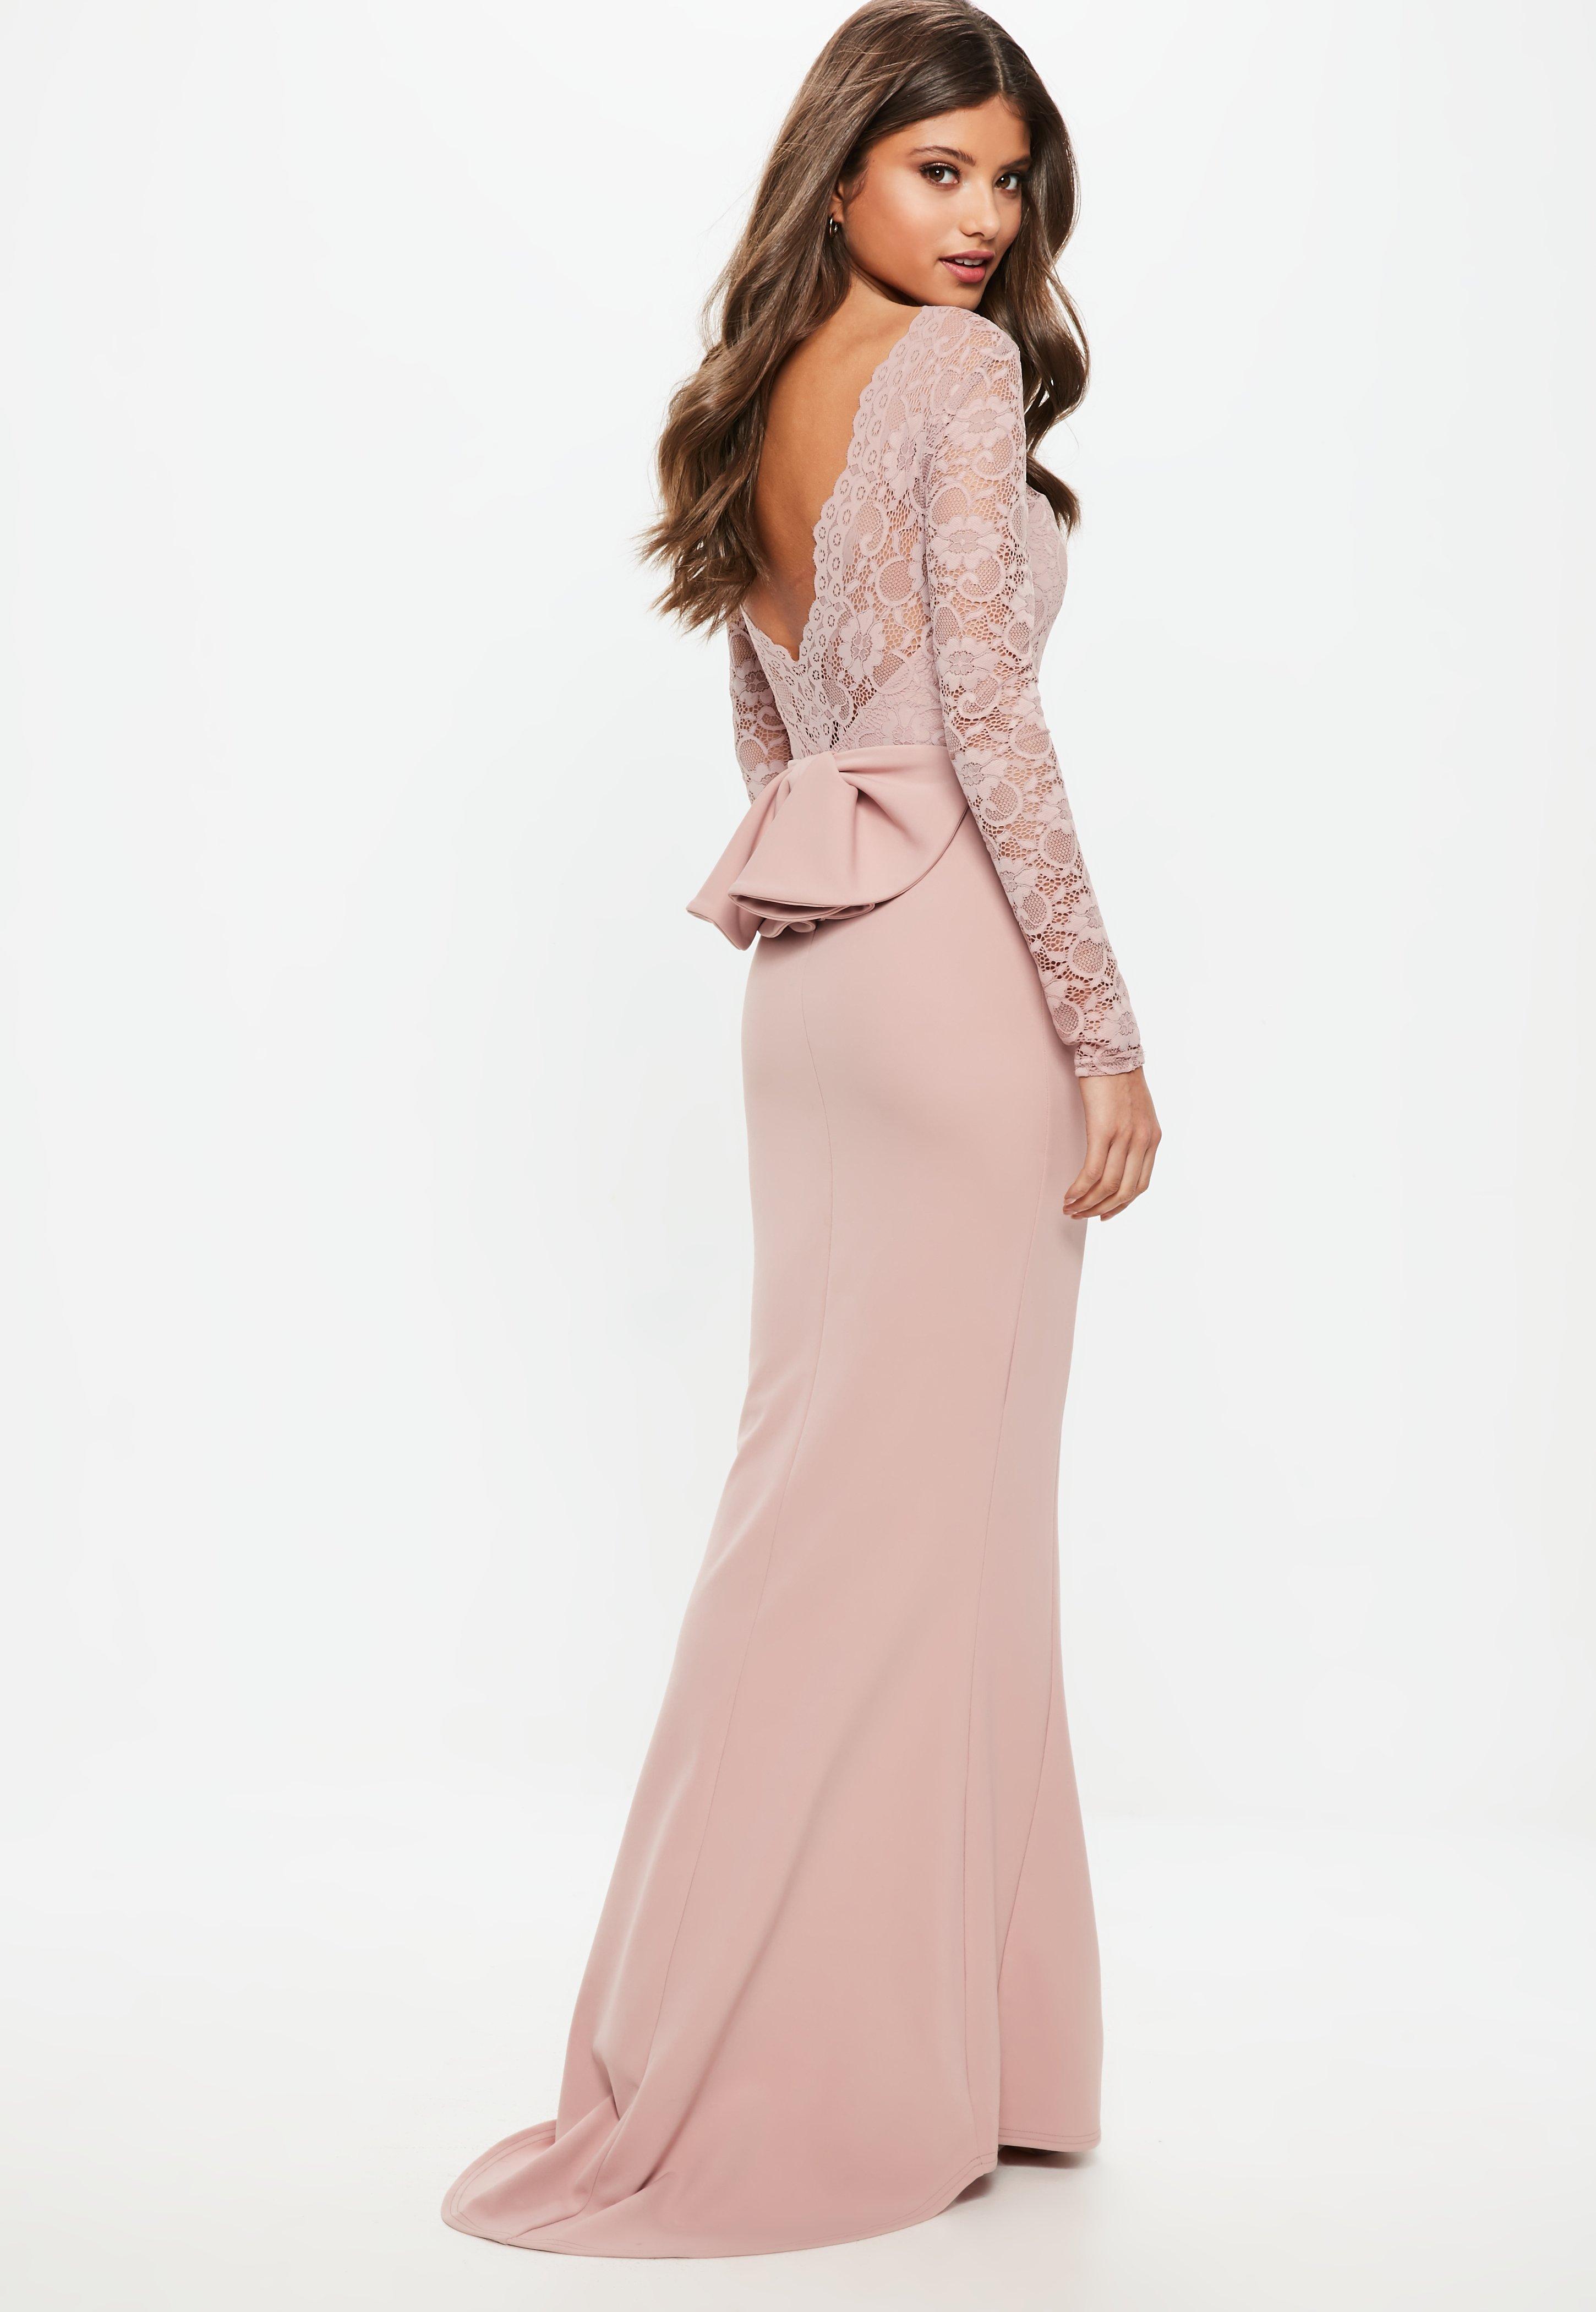 Vestidos dama de Honor | Vestidos para bodas online – Missguided